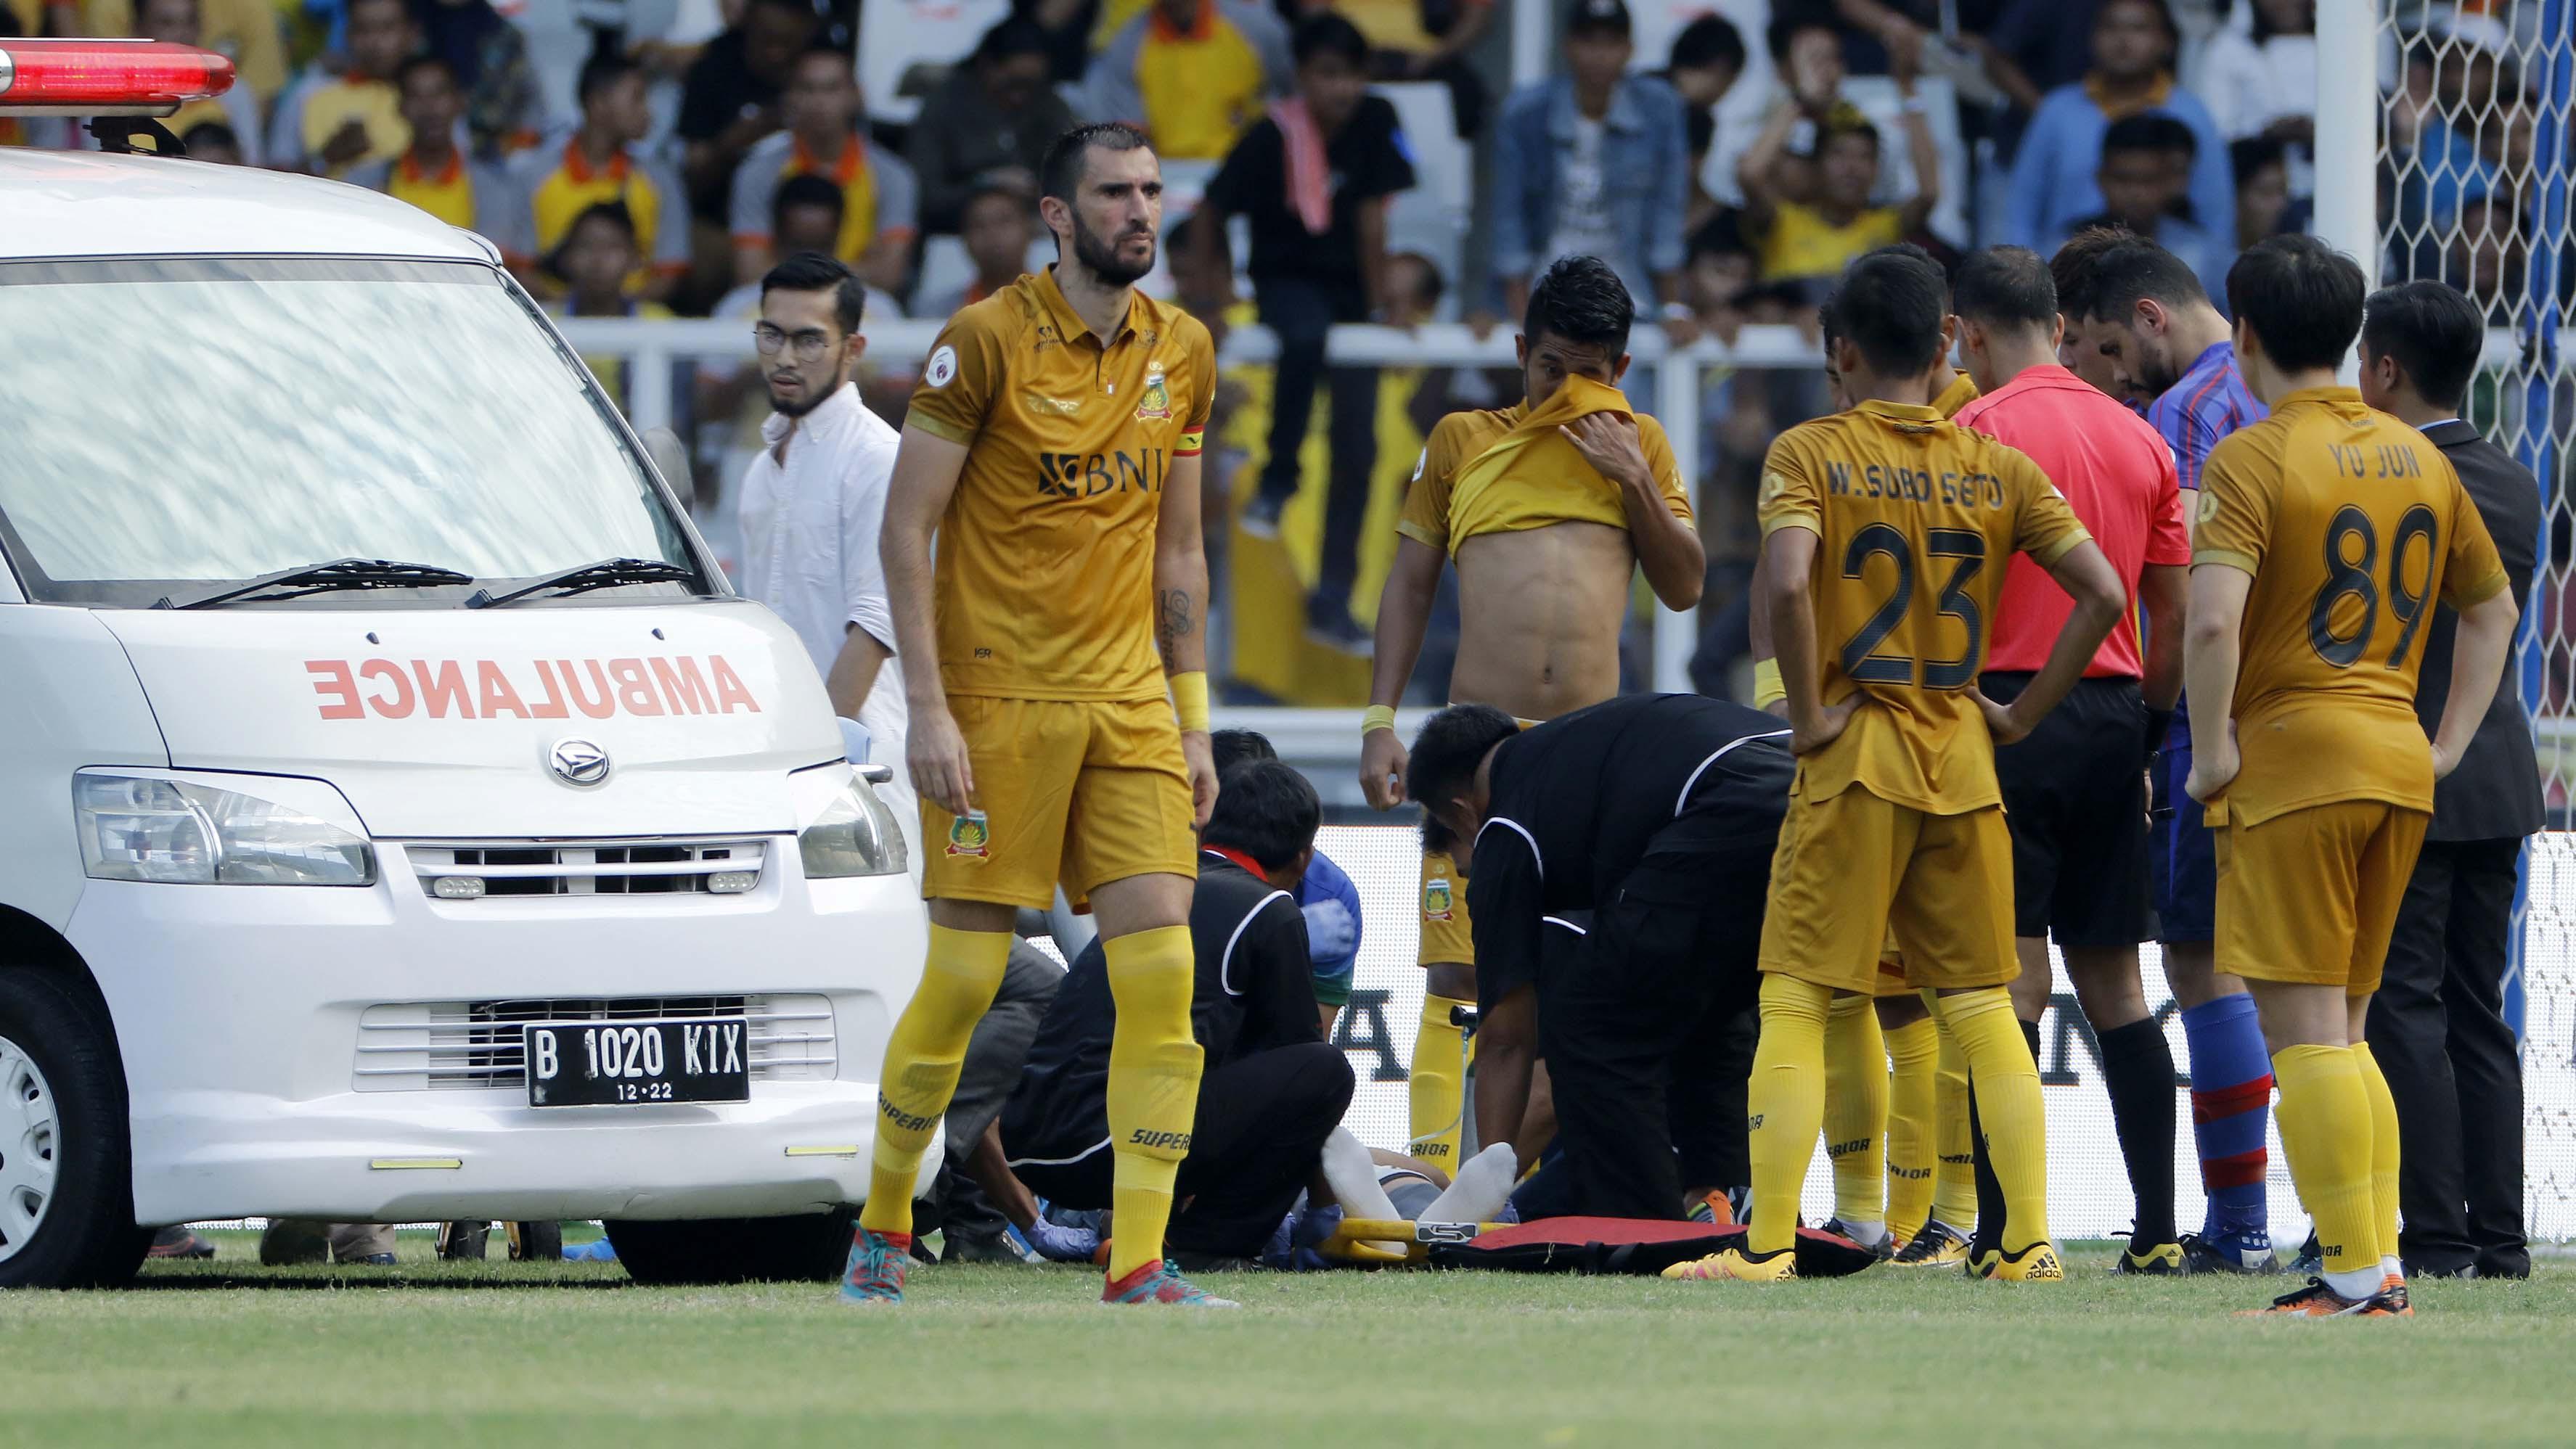 Awan Setho kiper Bhayangkara FC dievakuasi setelah insiden tabrakan dengan pemain FC Tokyo dalam laga persahabatan yang digelar di Stadion Utama Gelora Bung Karno, Senayan, Jakarta pada Sabtu (27/1/2018). (Bola.com/Peksi Cahyo)